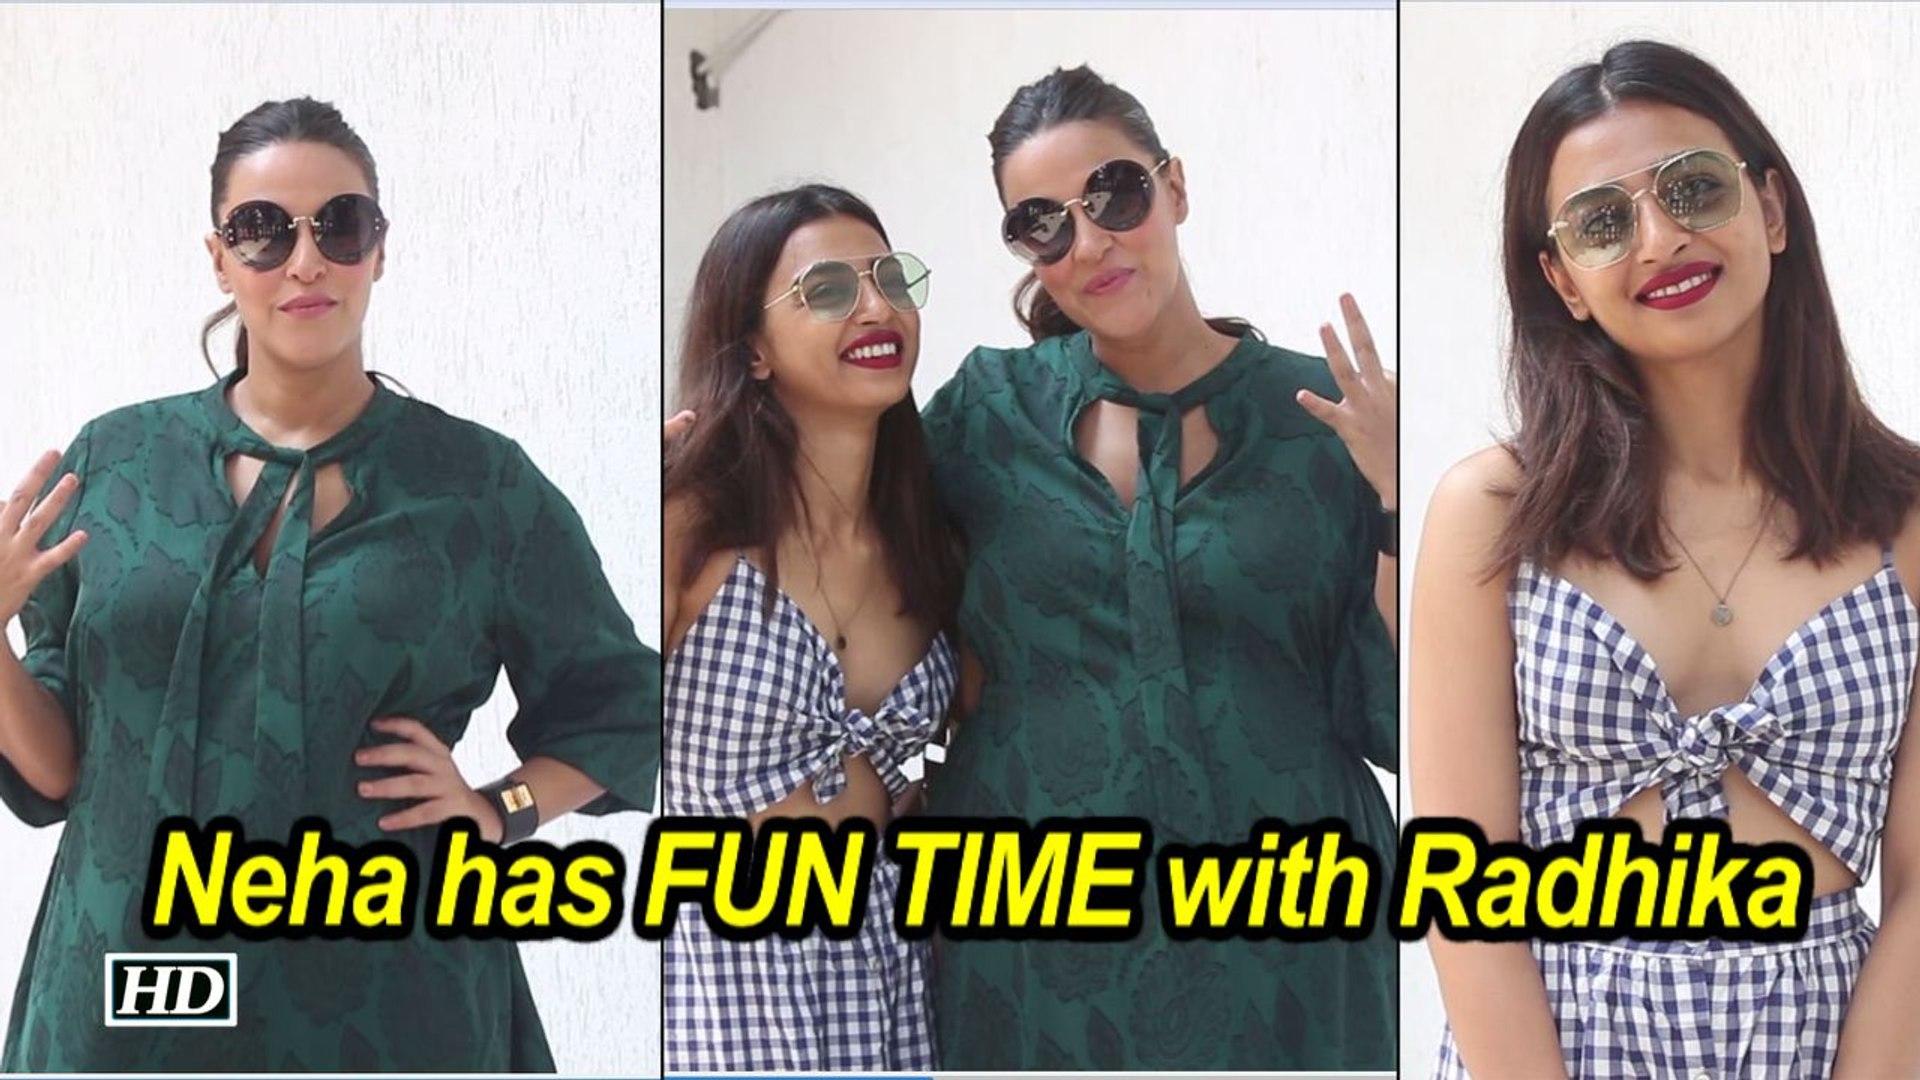 #NoFilterNeha : Neha Dhupia has FUN TIME with Radhika Apte